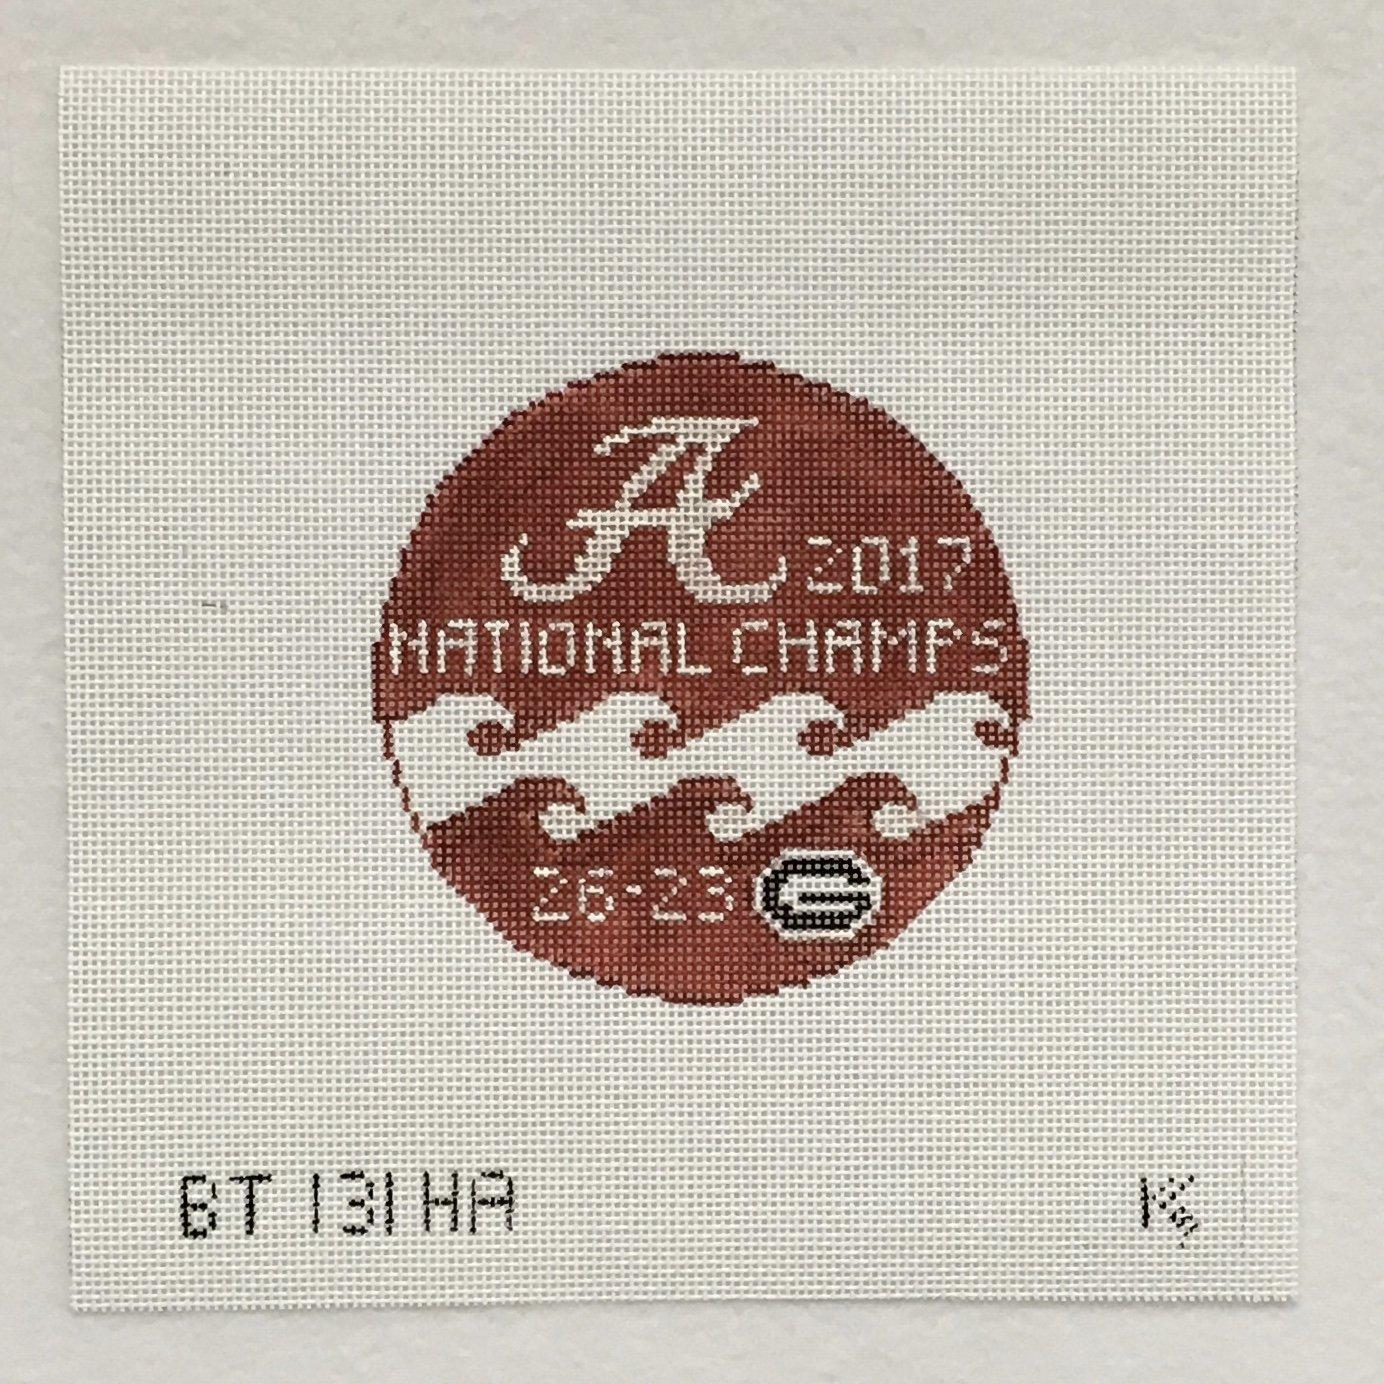 BT131HA Alabama National Champs Wave 2017